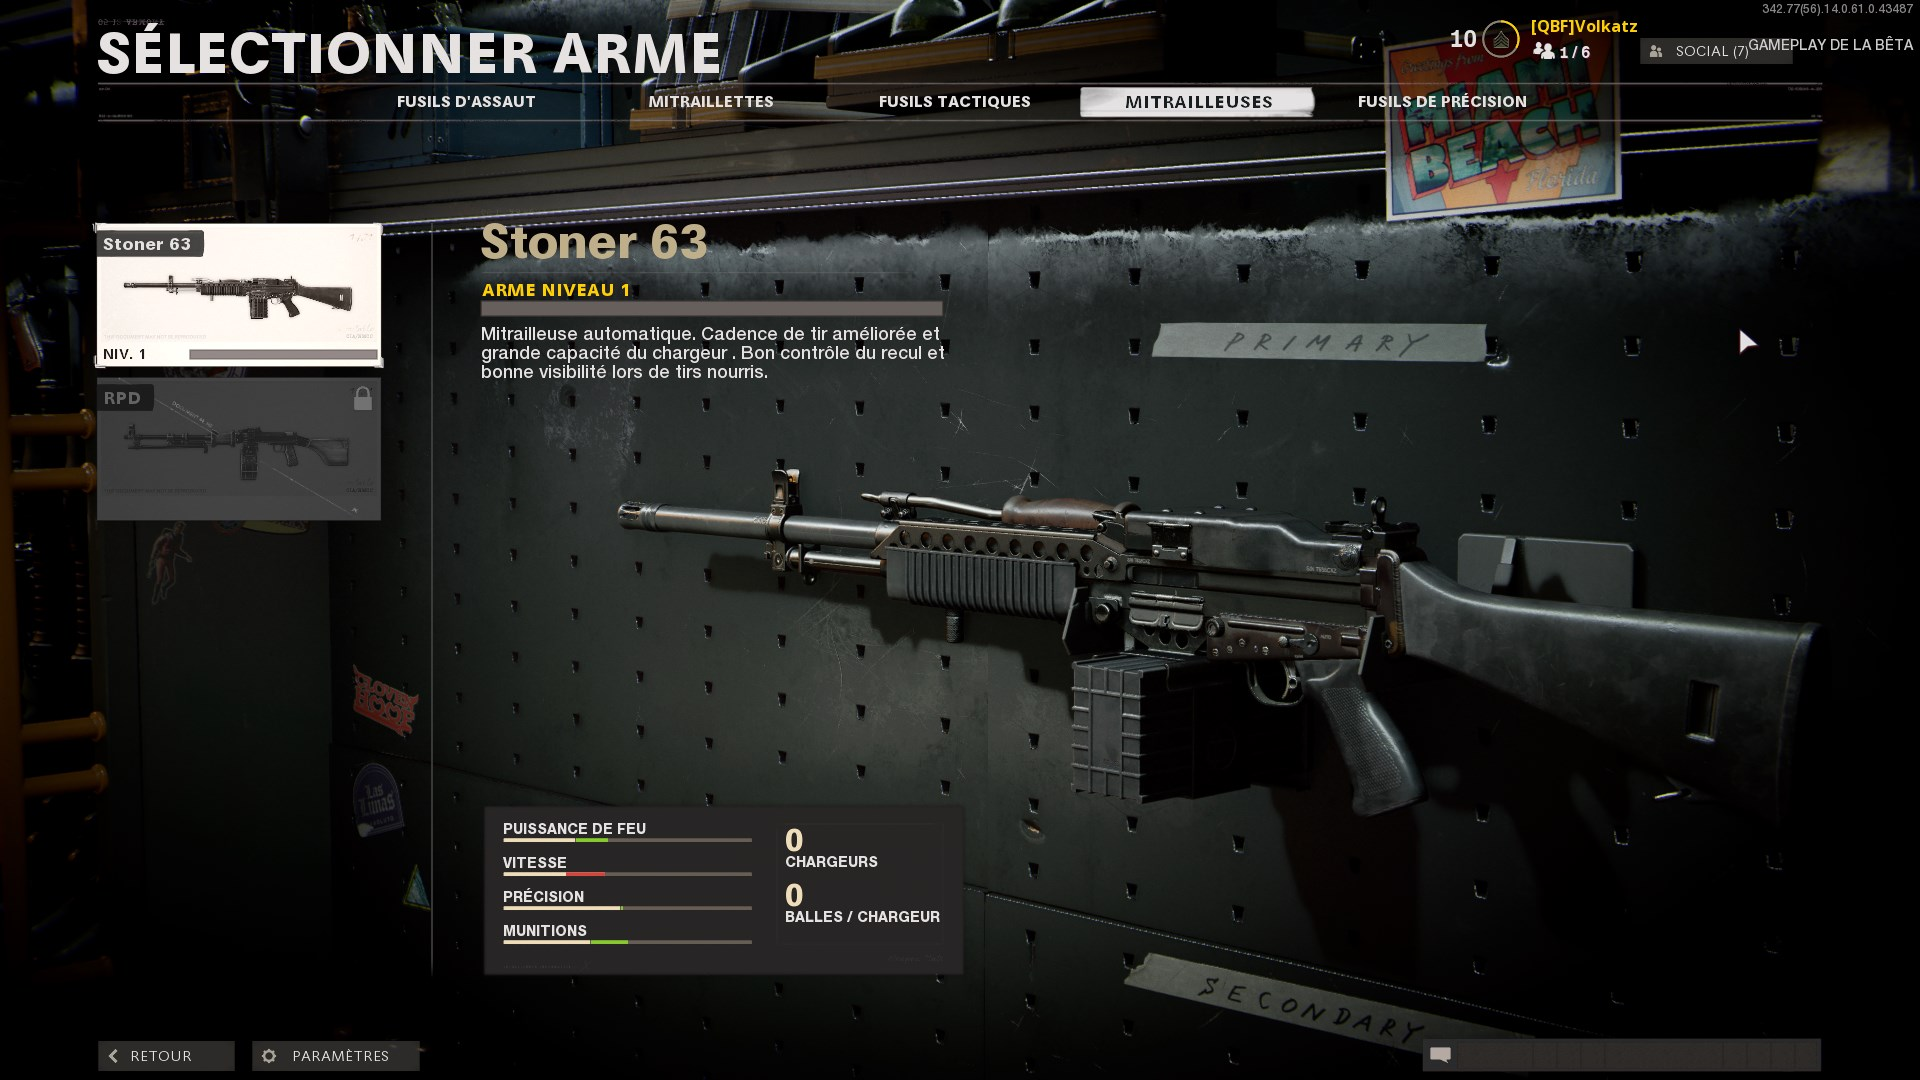 stoner-63-lmg-classe-loadout-cold-war-warzone-cod